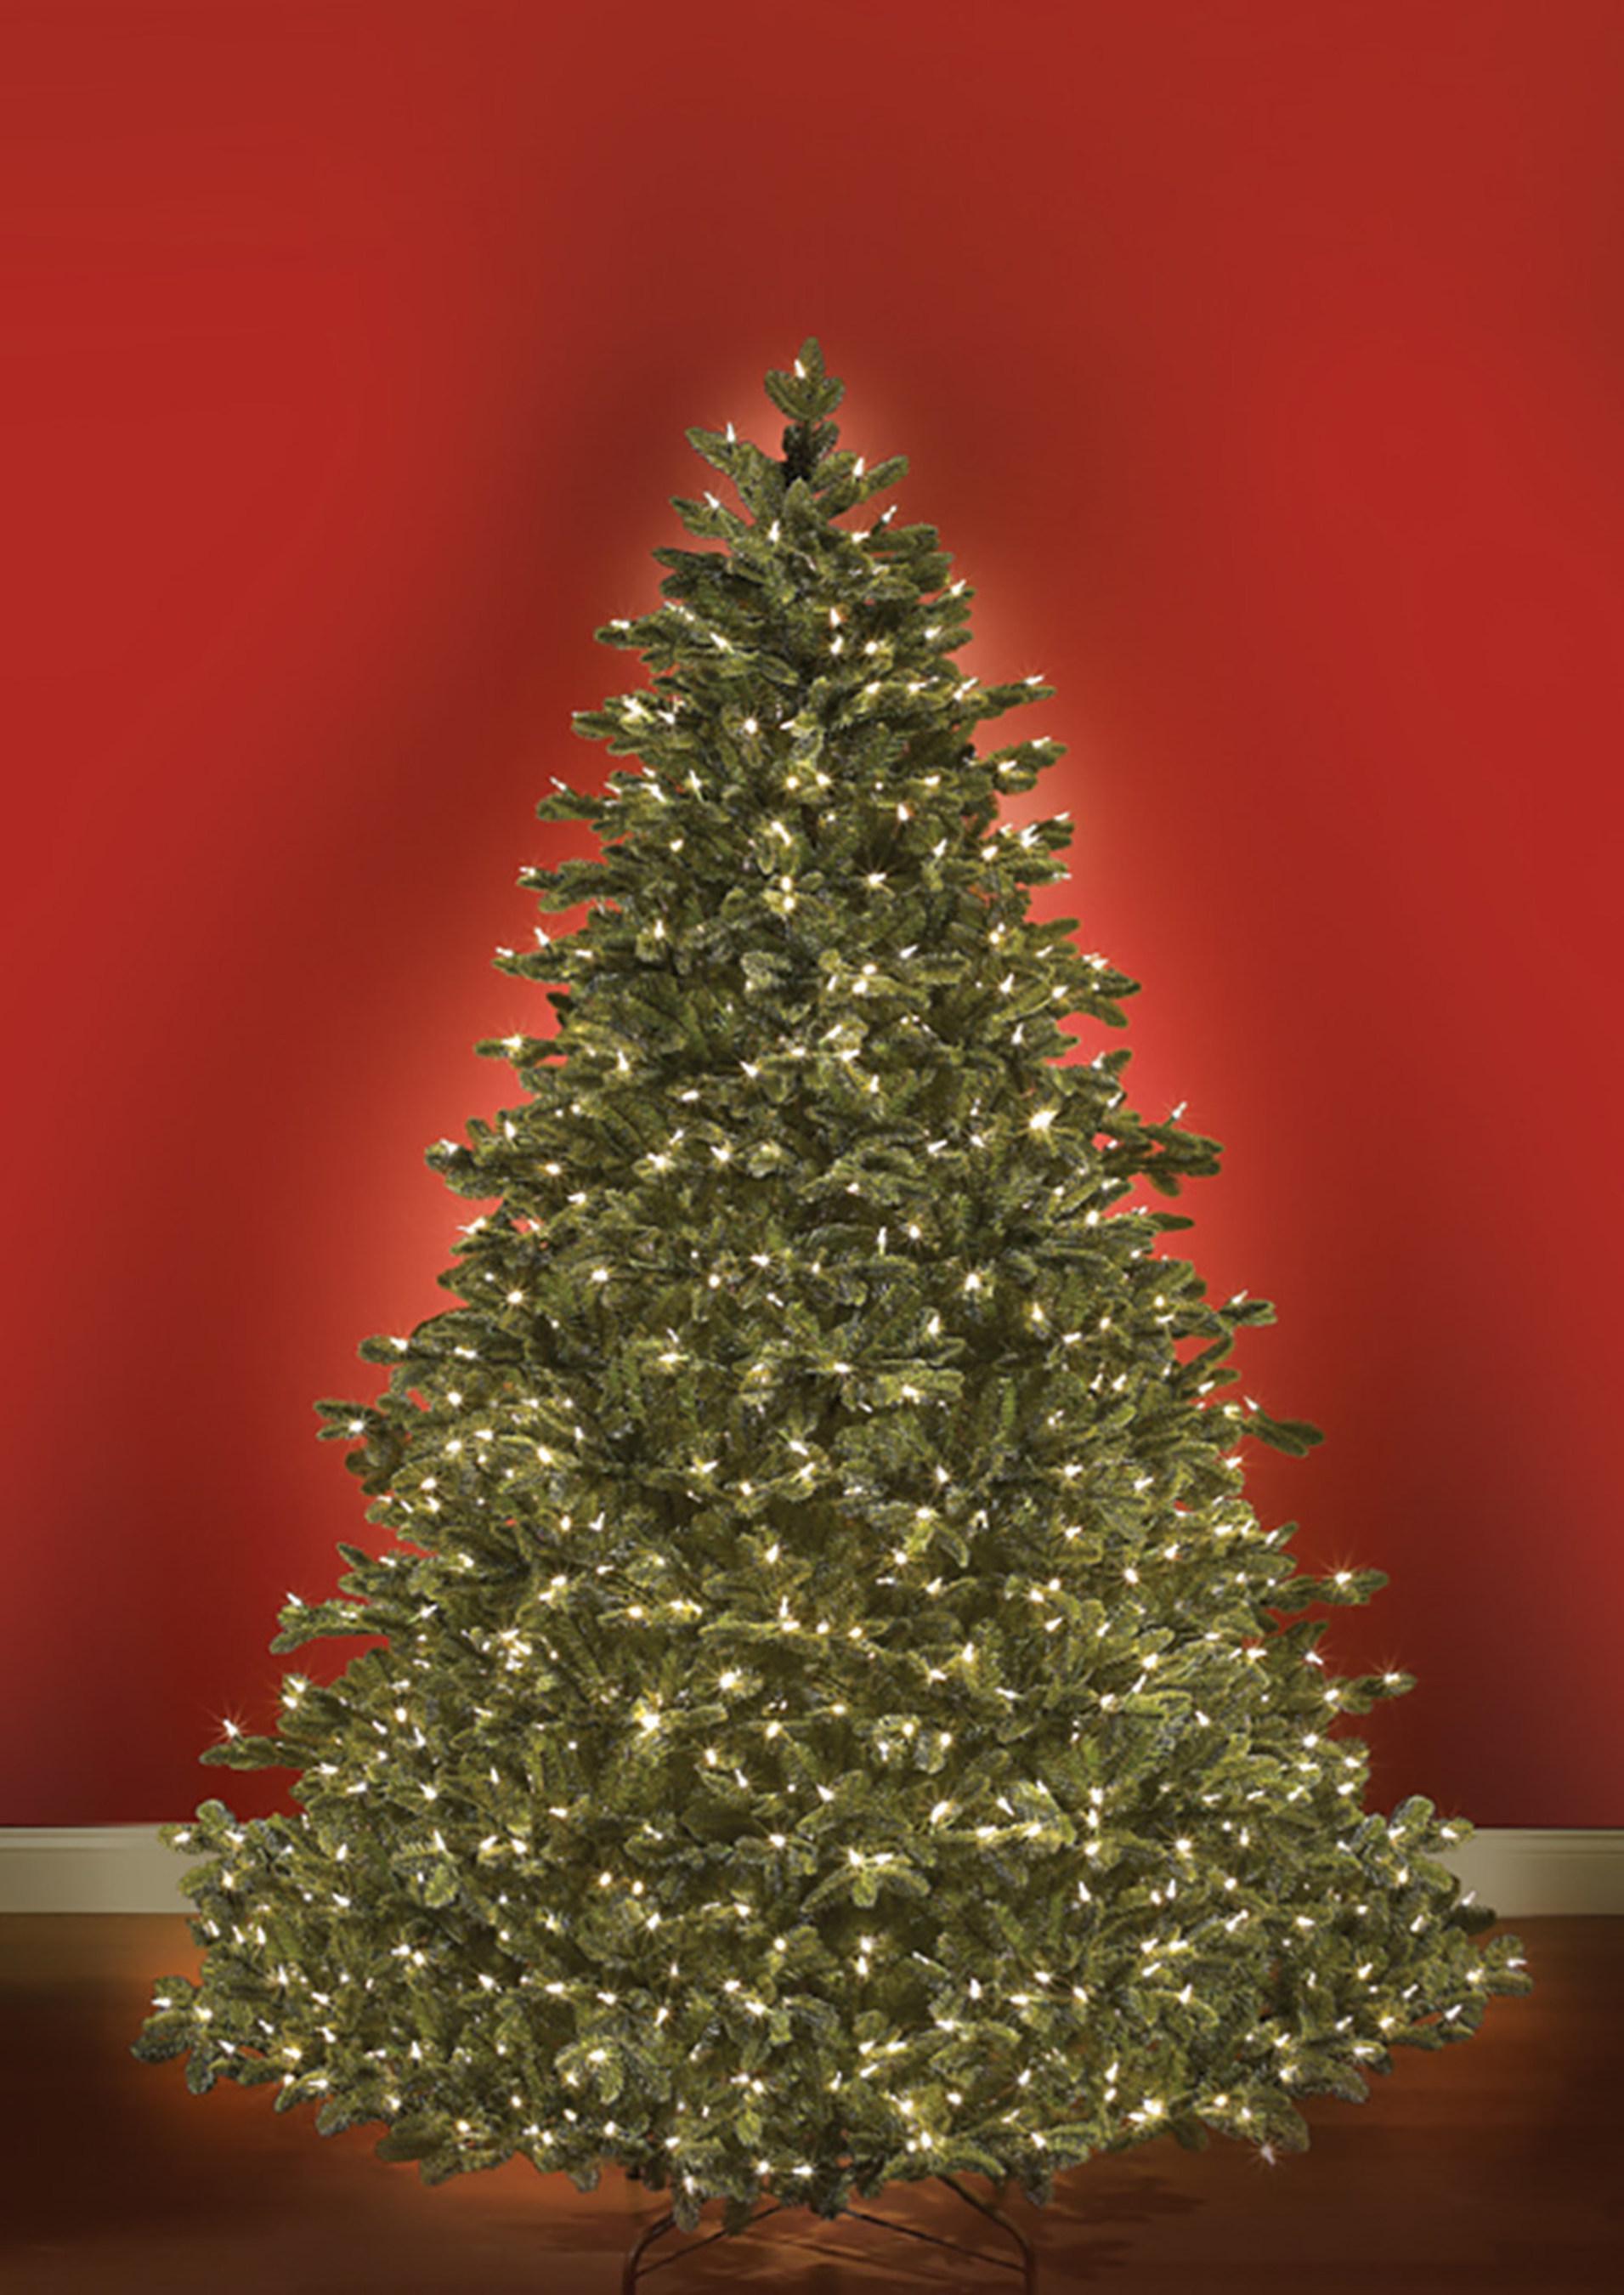 Hammacher Schlemmer The World's Best Christmas Tree Please visit us on 147 E 57th Street, between Lexington and Third Avenue.